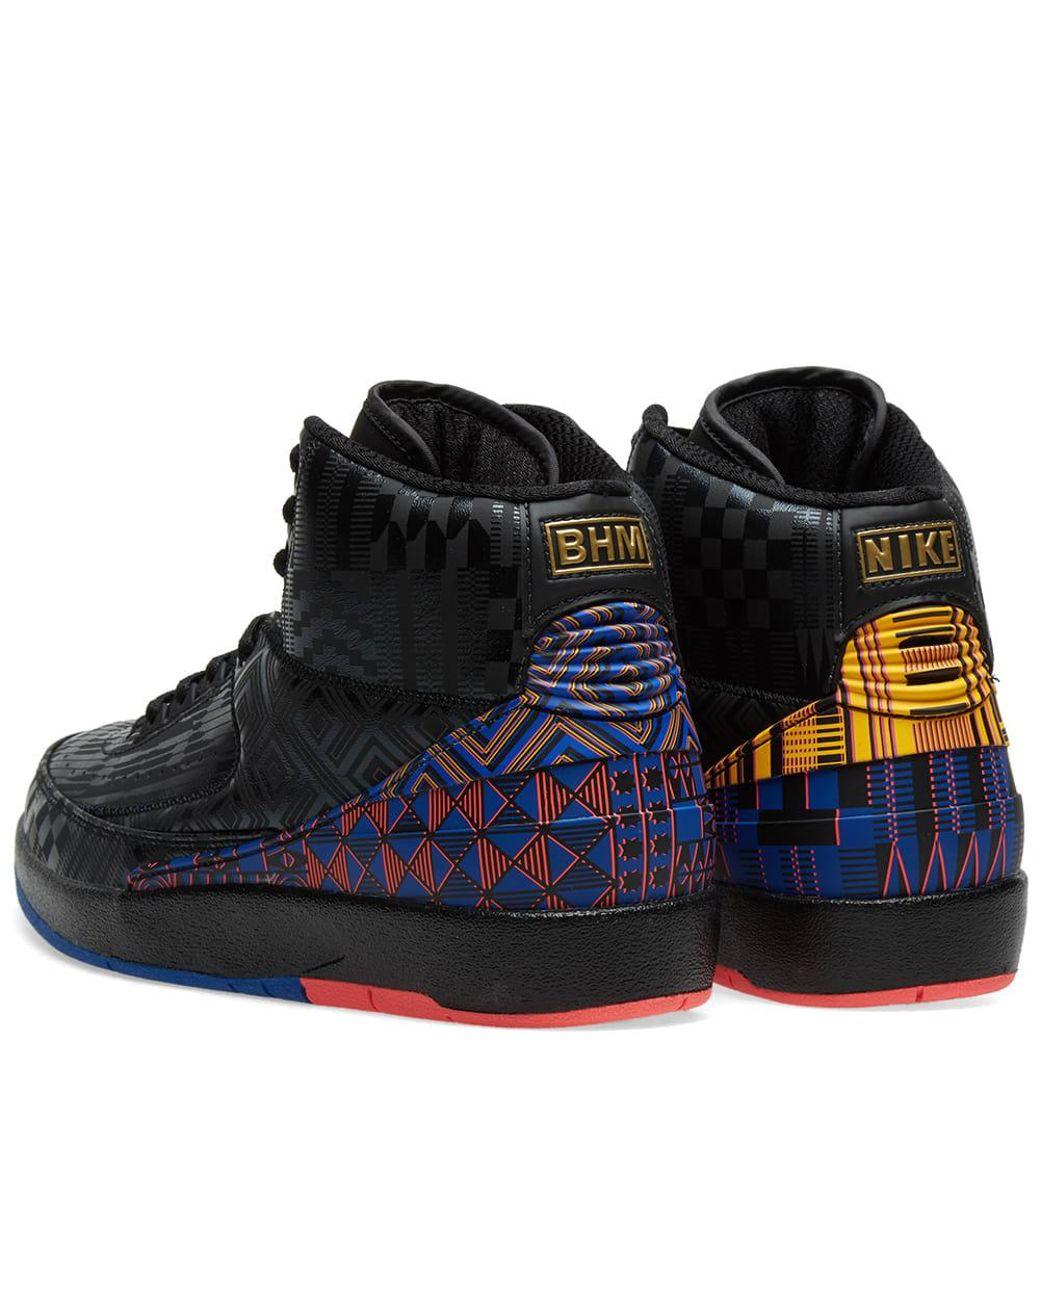 info for a7a70 1a96d Men's Black Air Jordan 2 Retro Bhm